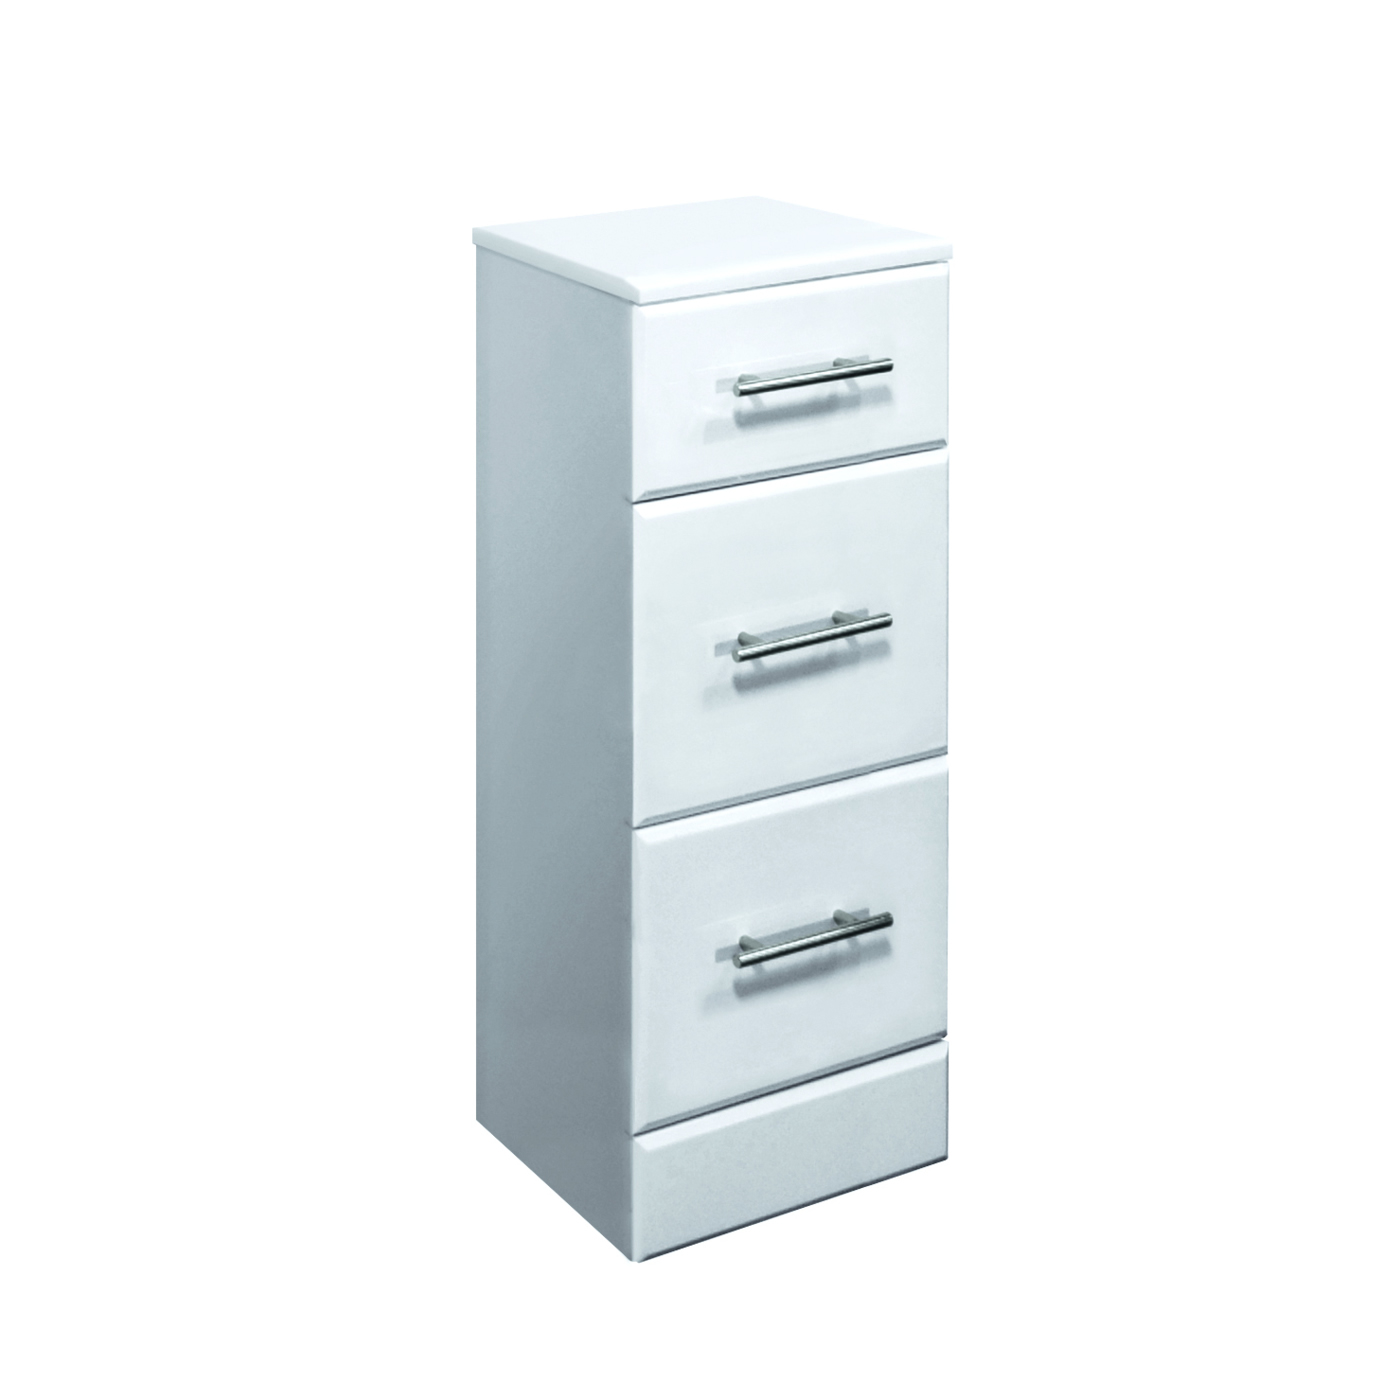 Premier 350x330mm Classic 3 Drawer Unit Gloss White